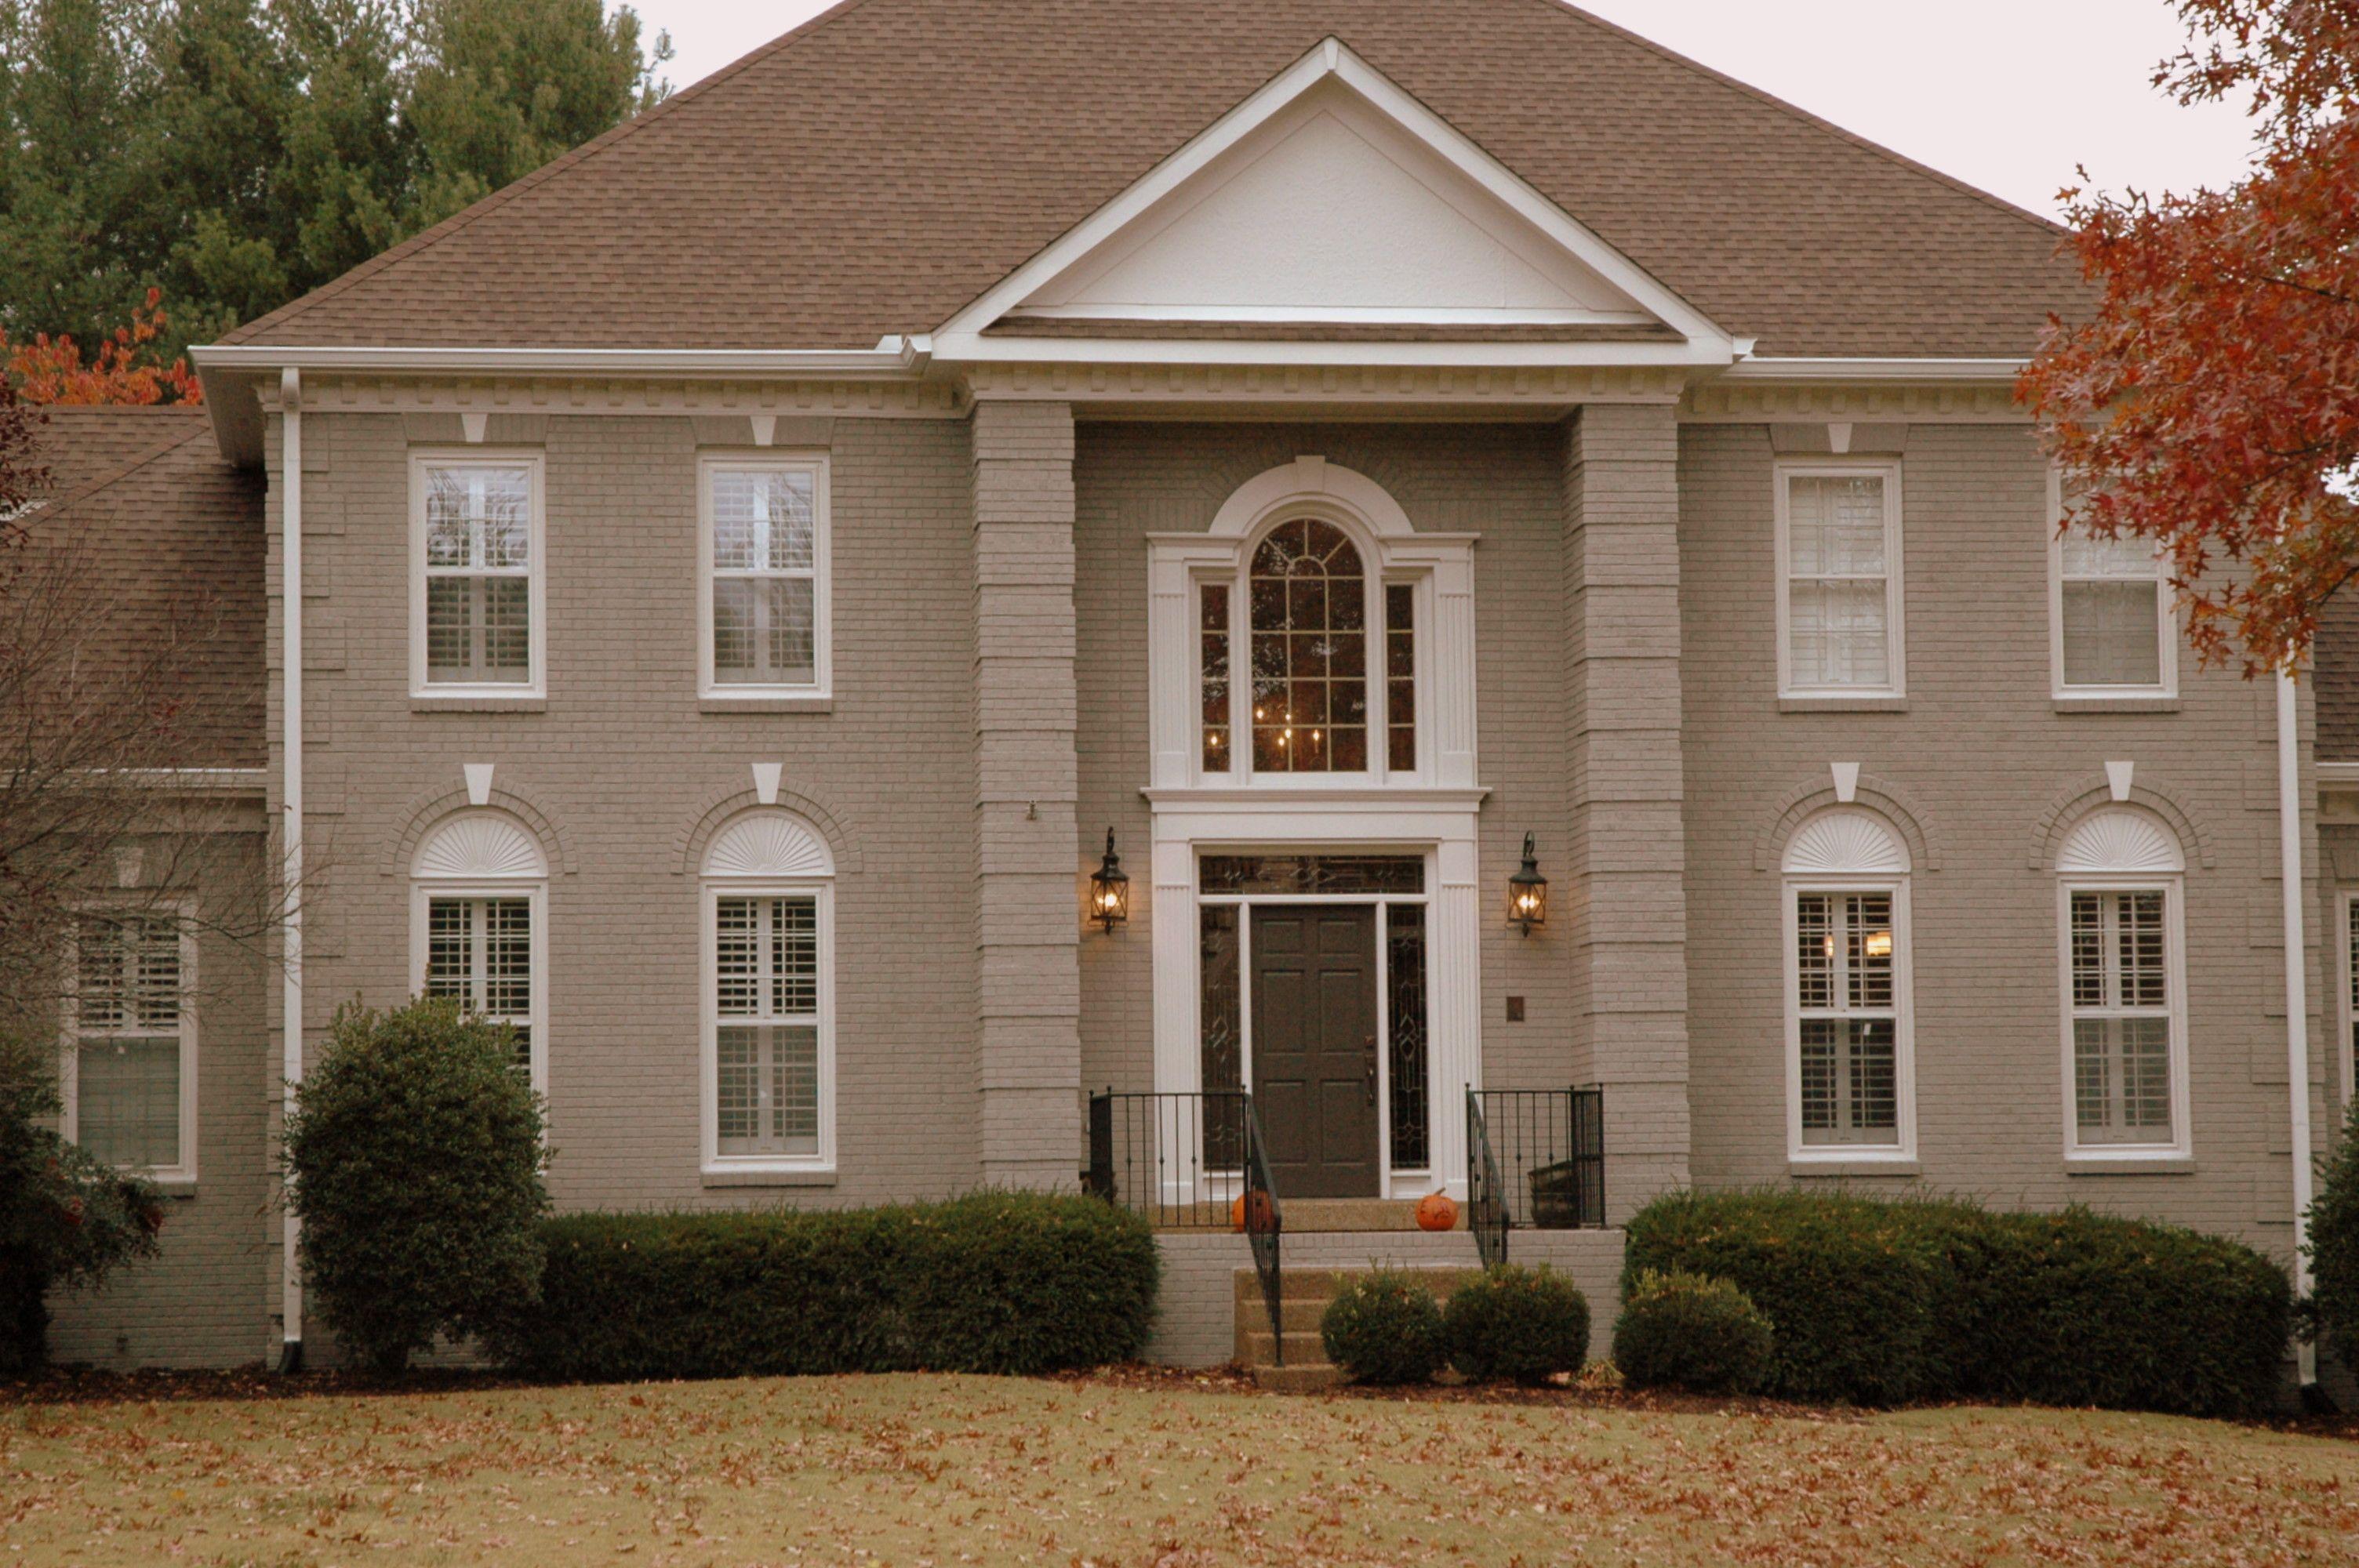 Remarkable Painted Brick Facade Exterior Paint Color With Black Door Largest Home Design Picture Inspirations Pitcheantrous